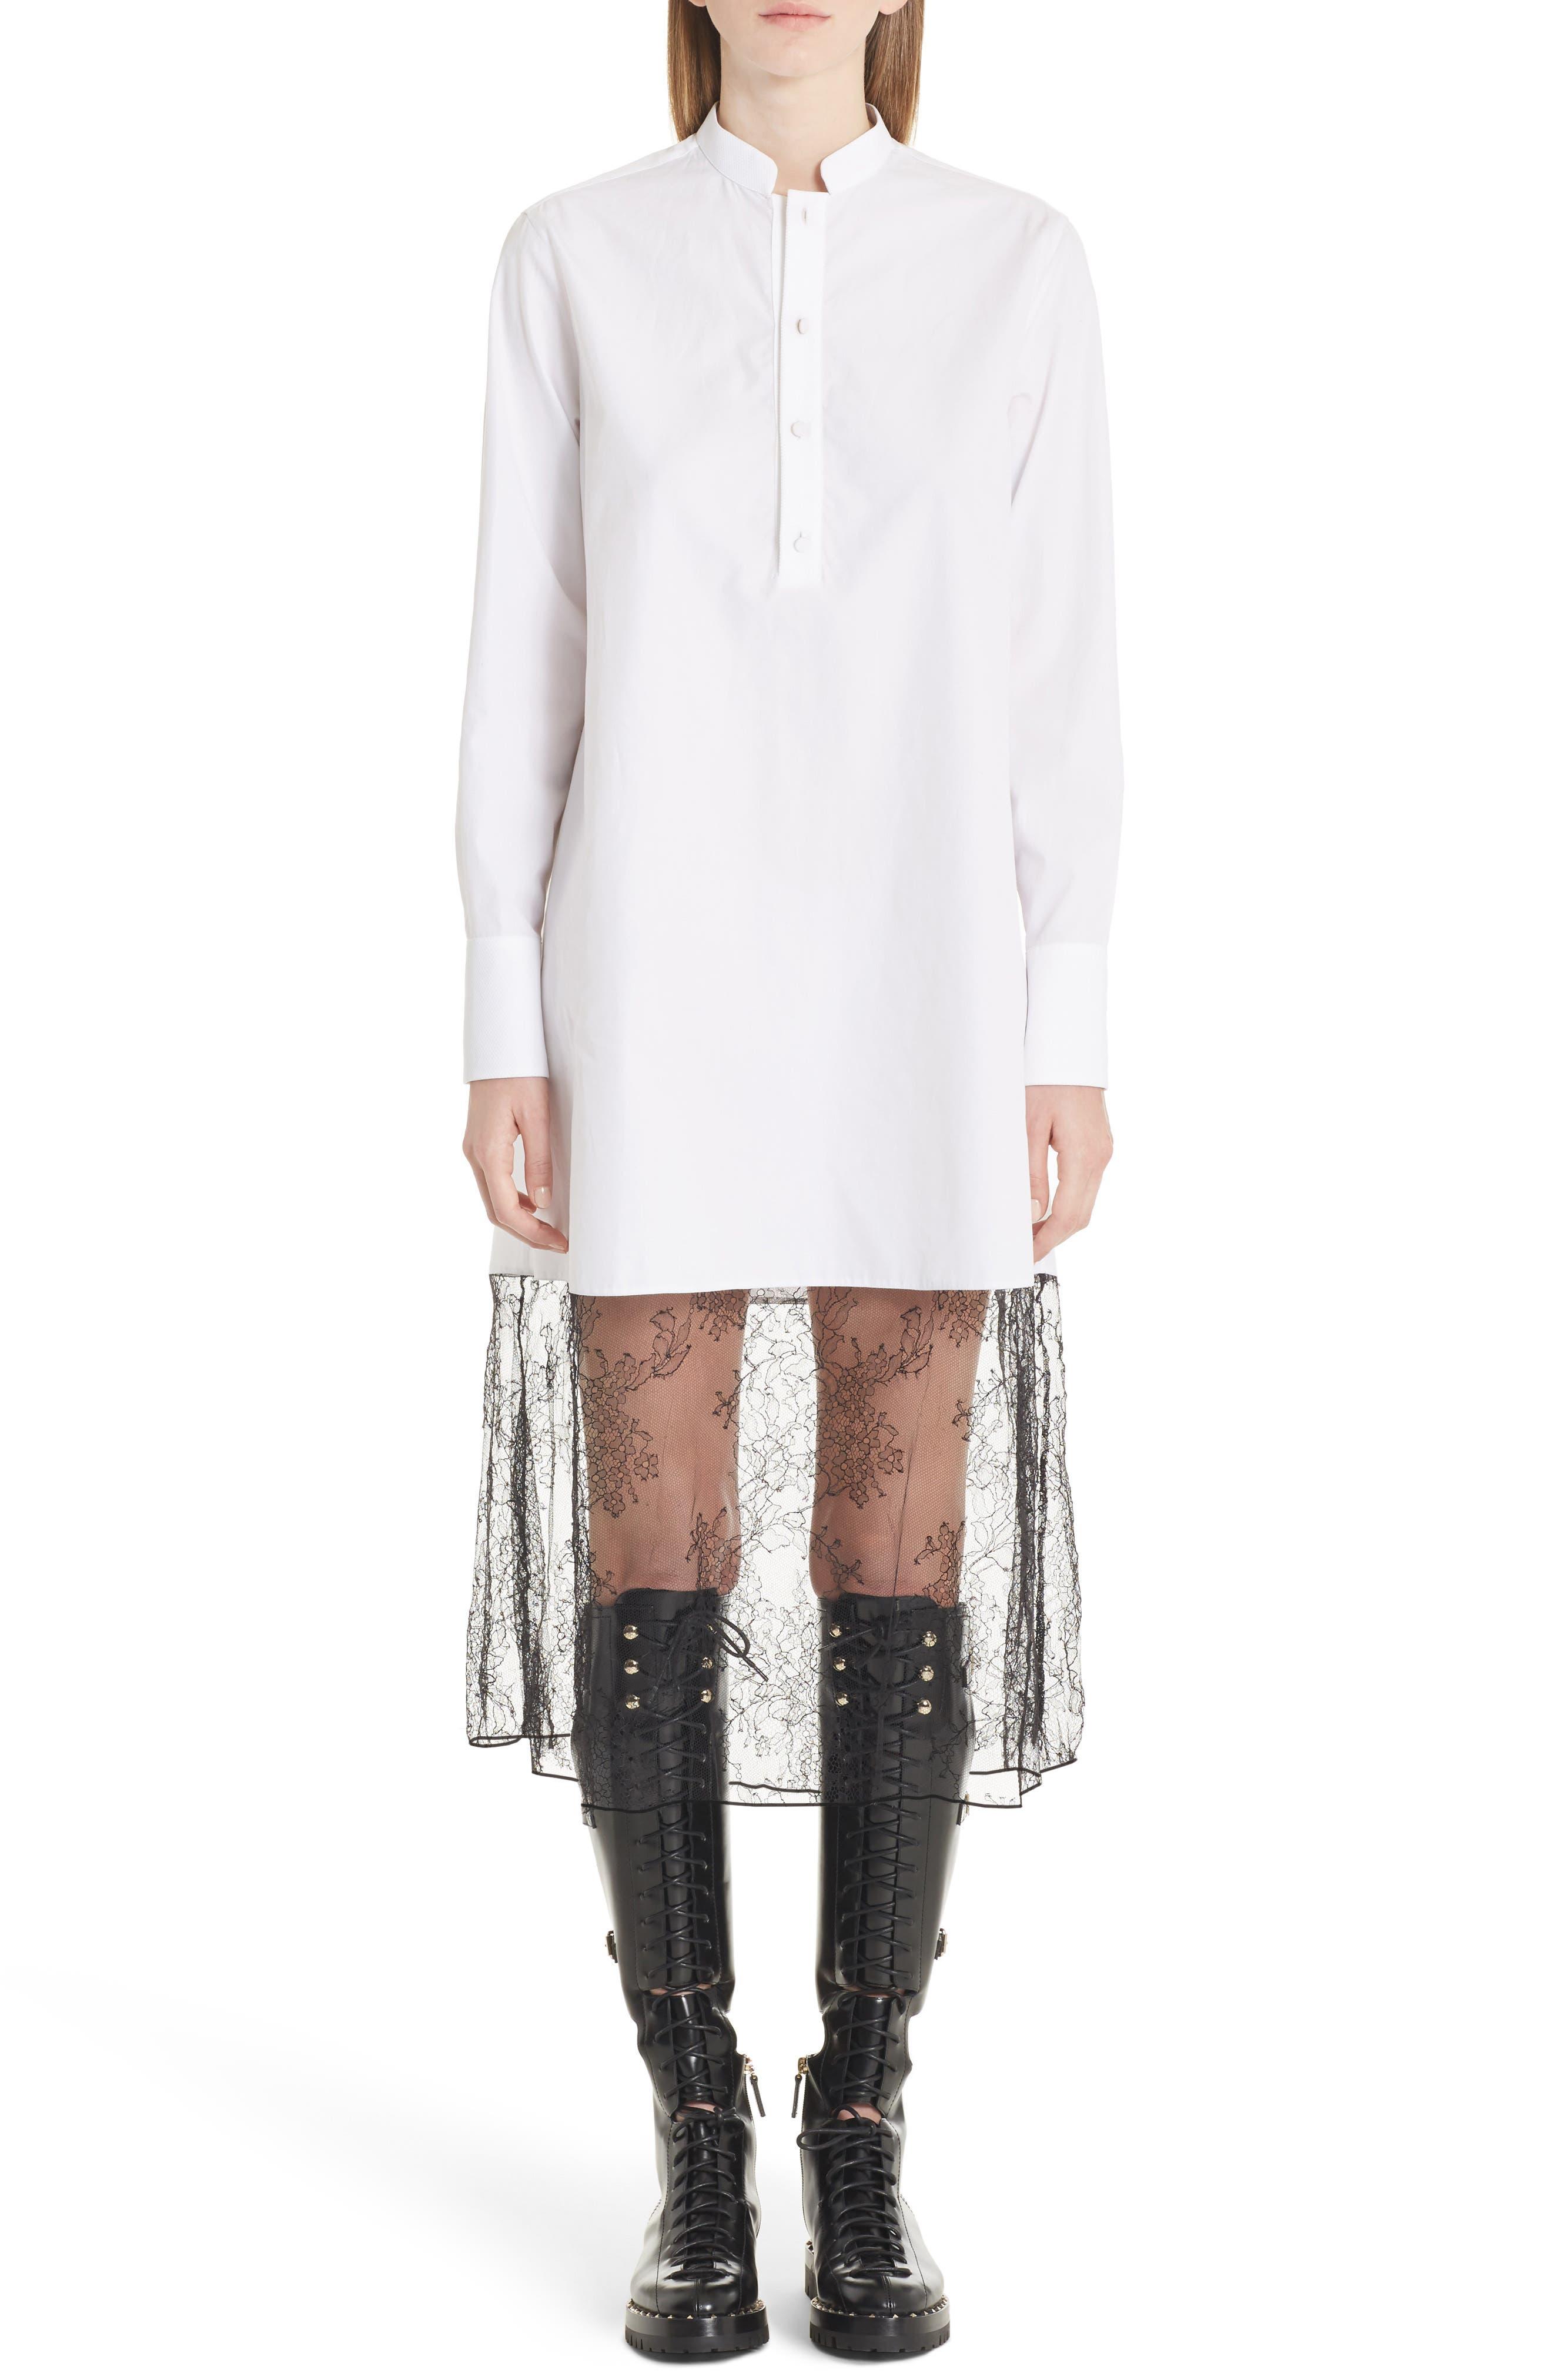 VALENTINO GARAVANI Valentino Lace Hem Cotton Poplin Shirtdress